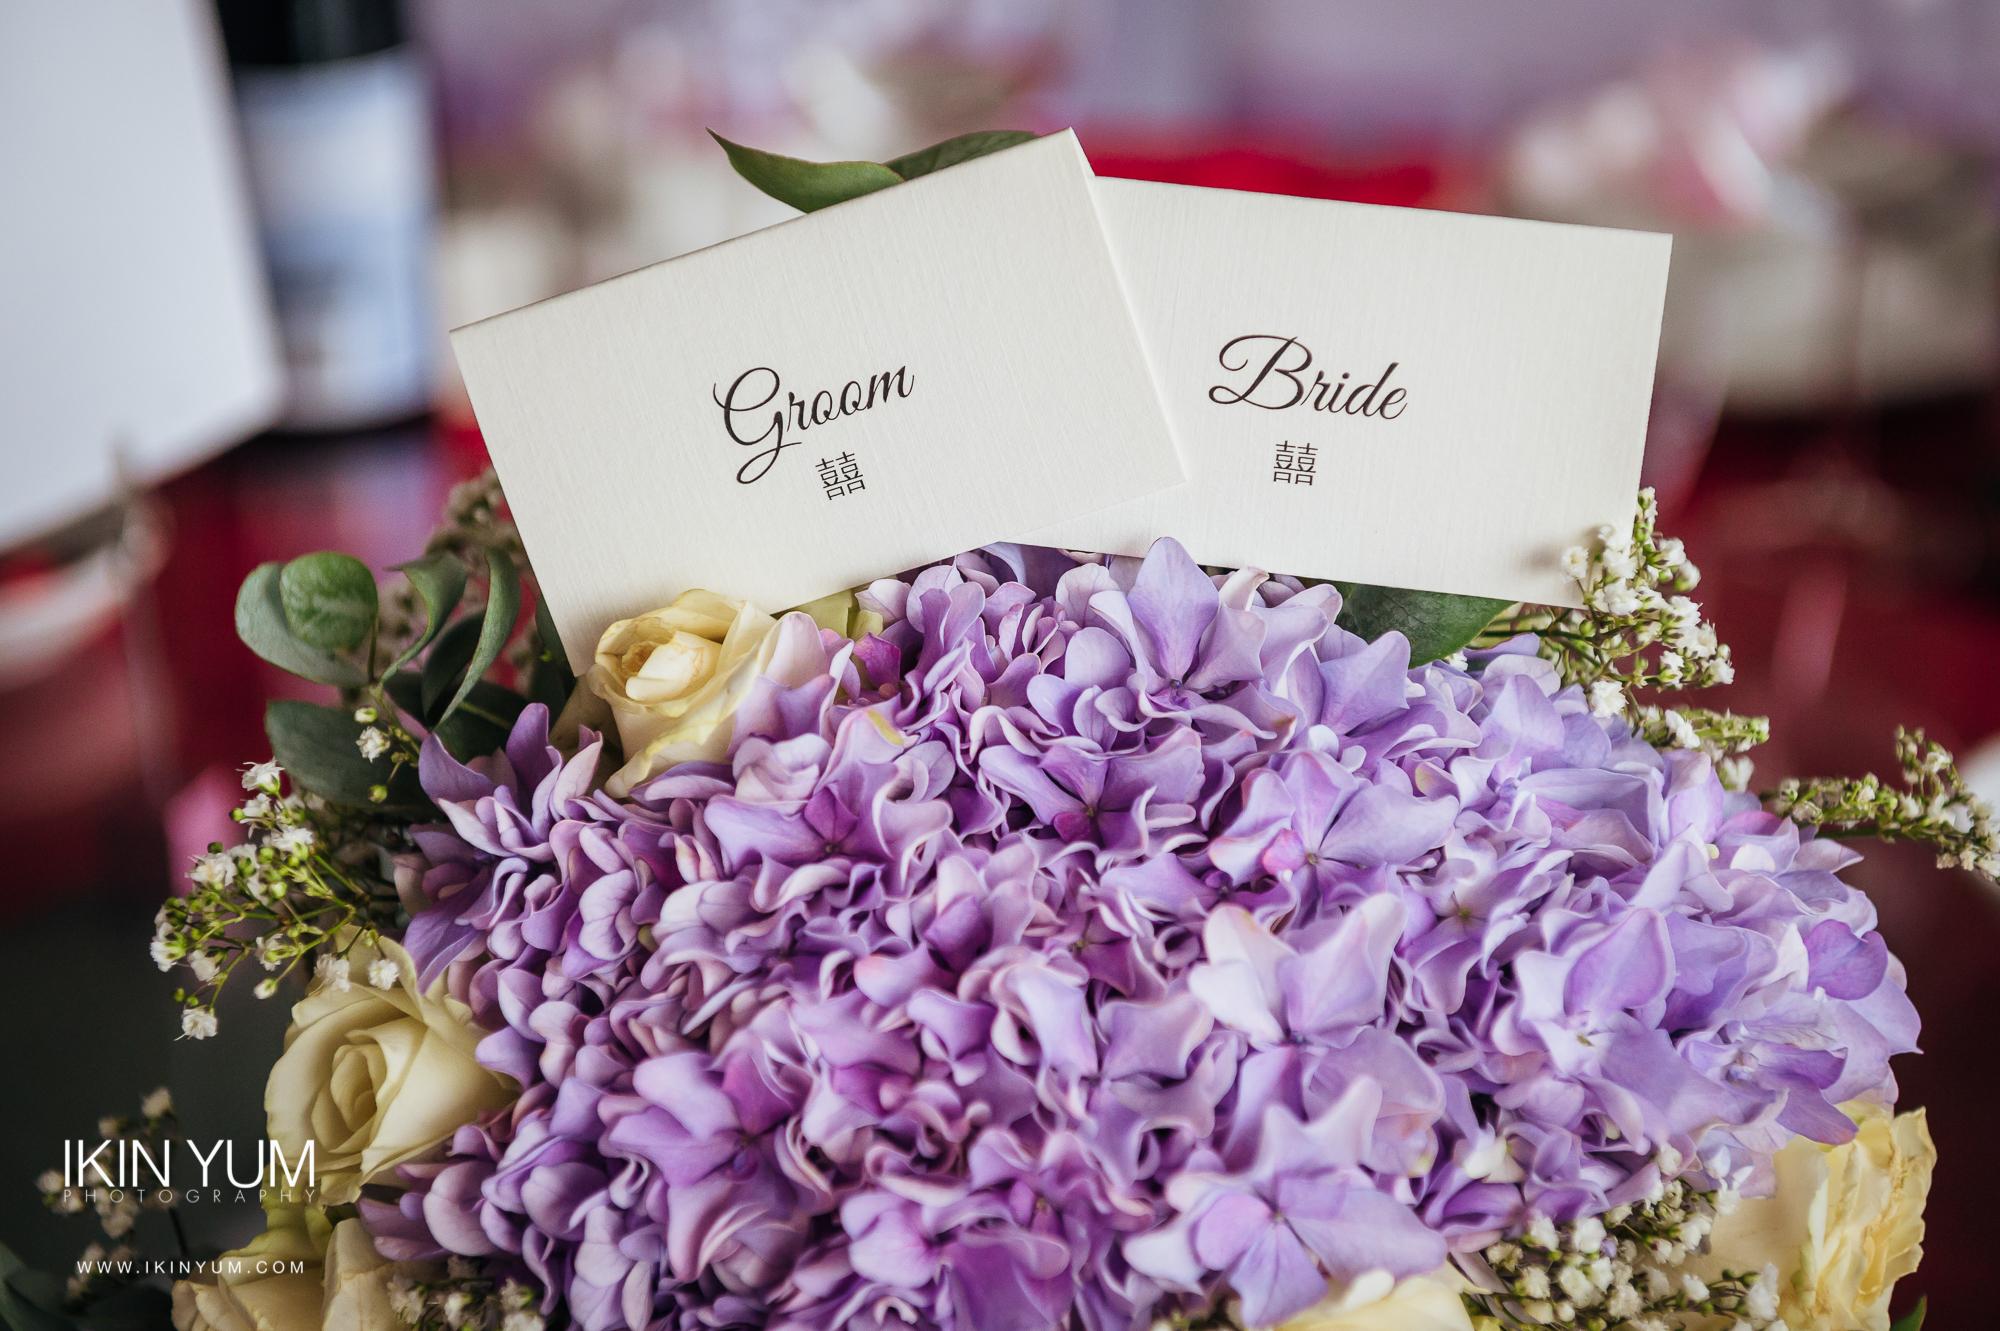 Syon Park Wedding - Ikin Yum Photography -110.jpg